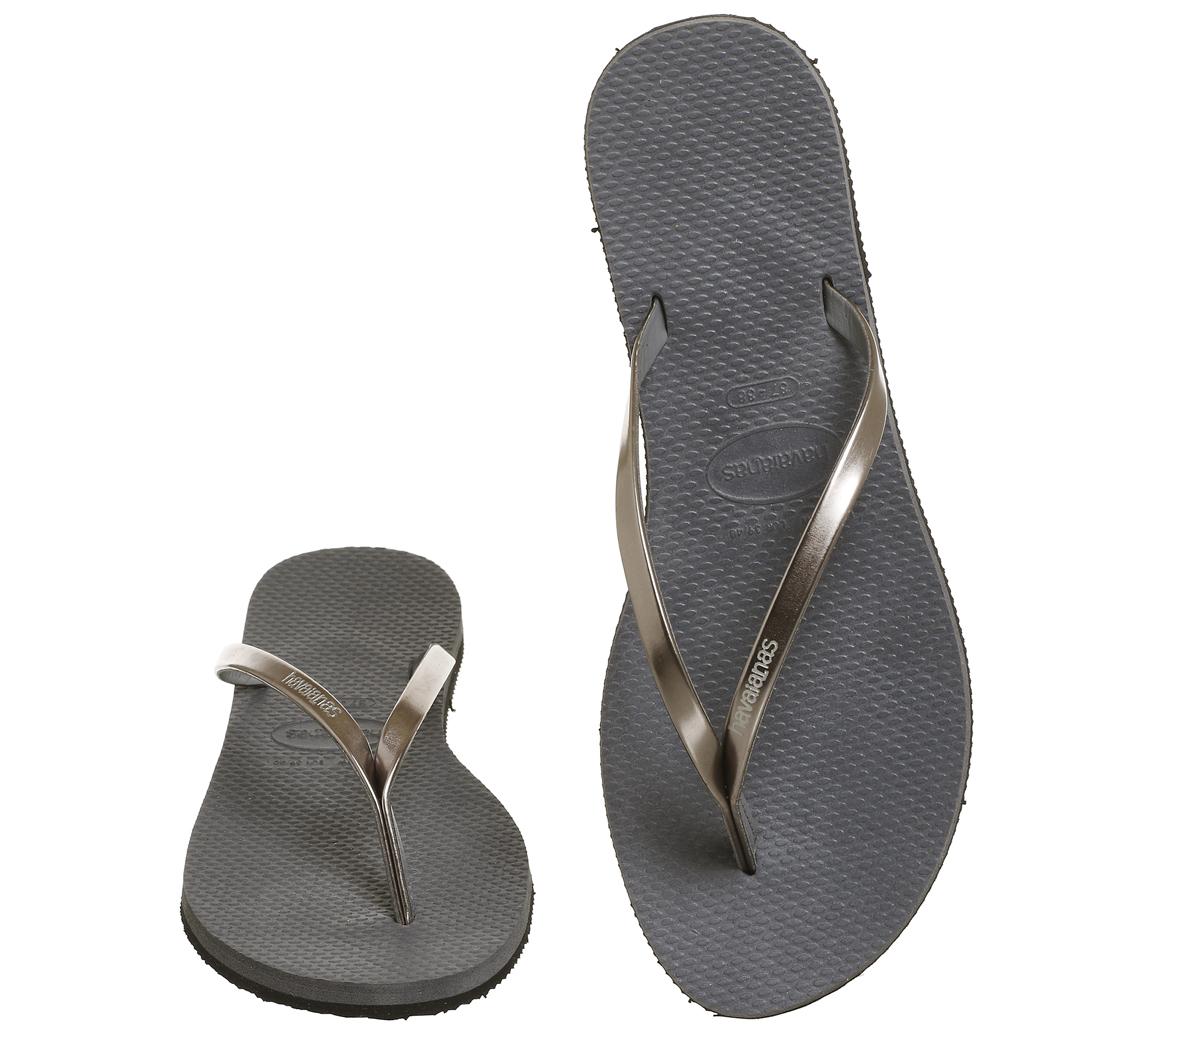 1f4668dabd84b4 Womens Havaianas Slim You Metallic Flip Flops Steel Grey Sandals